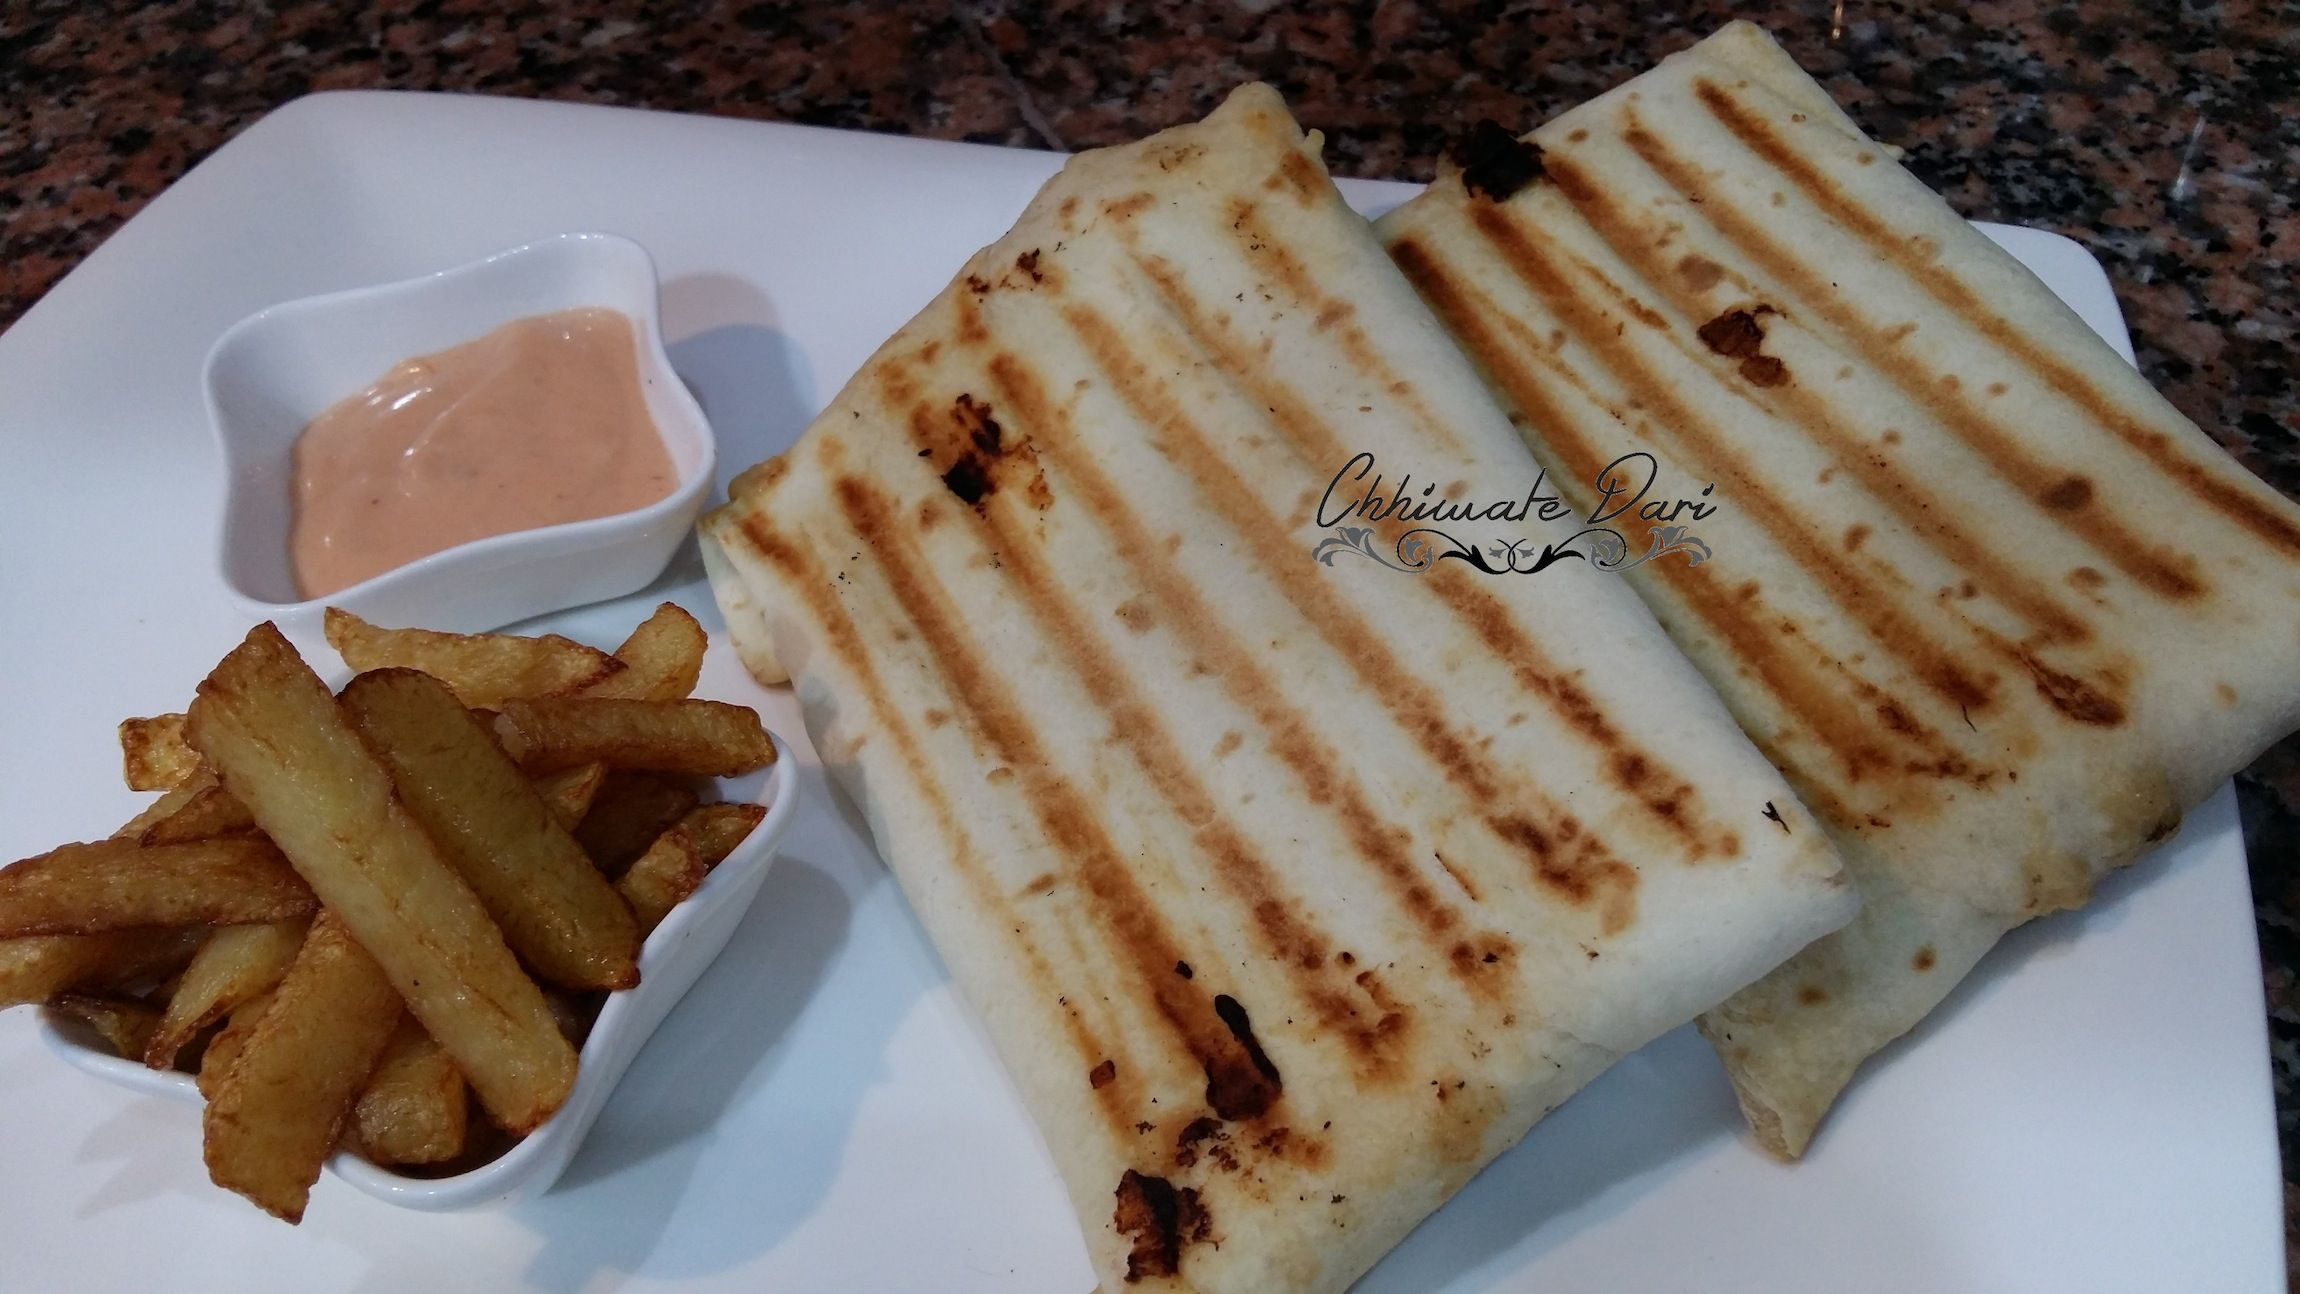 طاكوس بمقادير اقتصادية Un Delicieux Tacos Rectangulaire Maison Food Fast Food Healthy Recipes